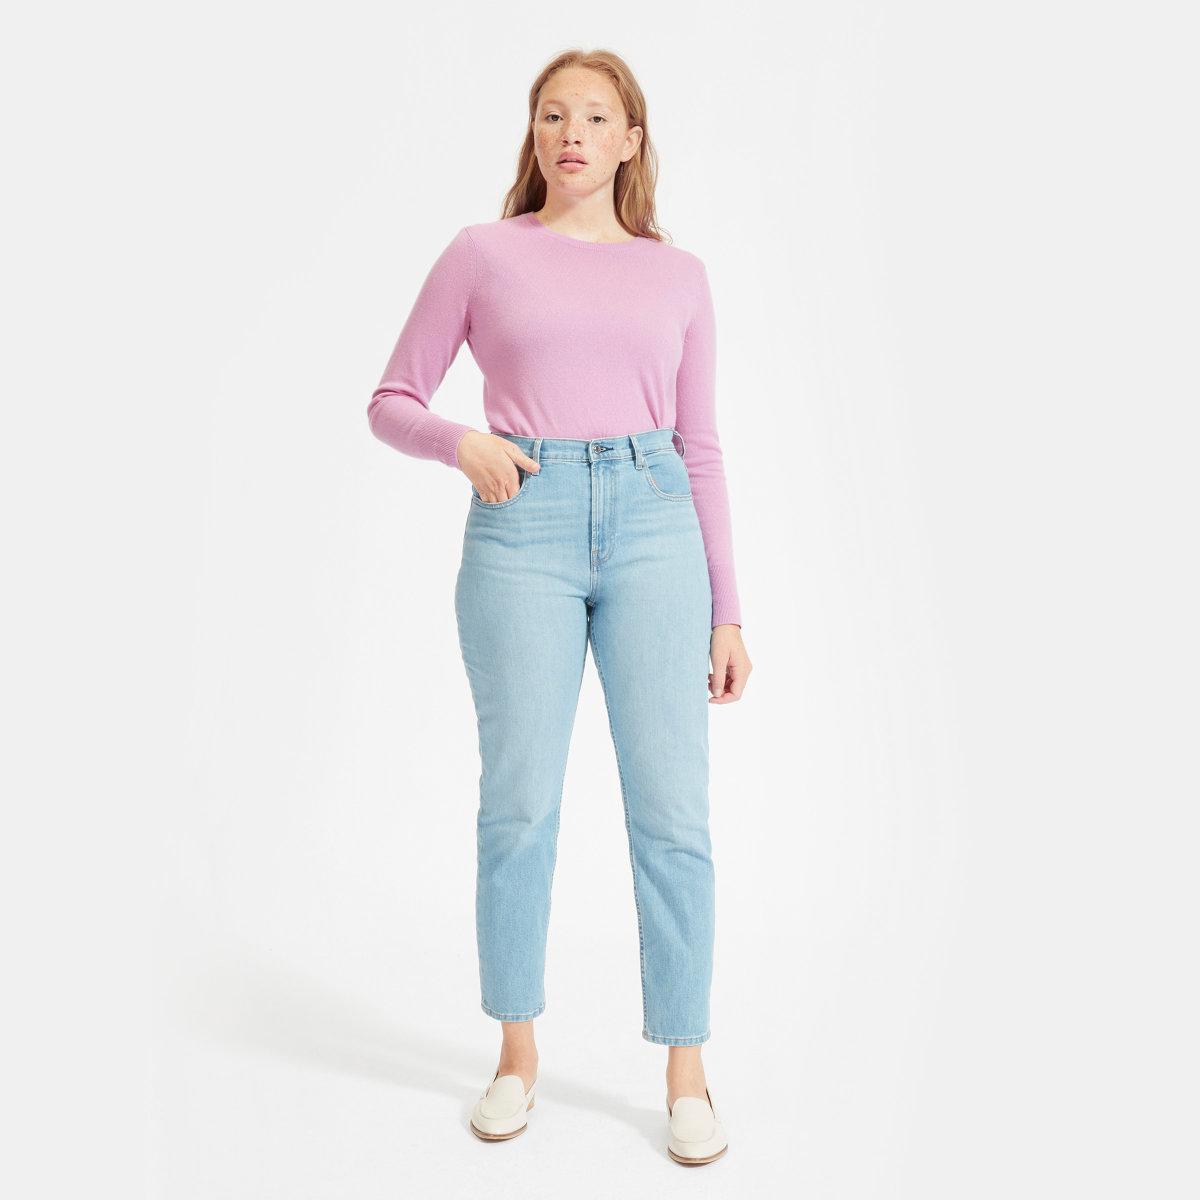 Everlane Choose What You Pay / Cashmere Crew Sweater - Sunshine Style, A Florida Based Fashion Blog